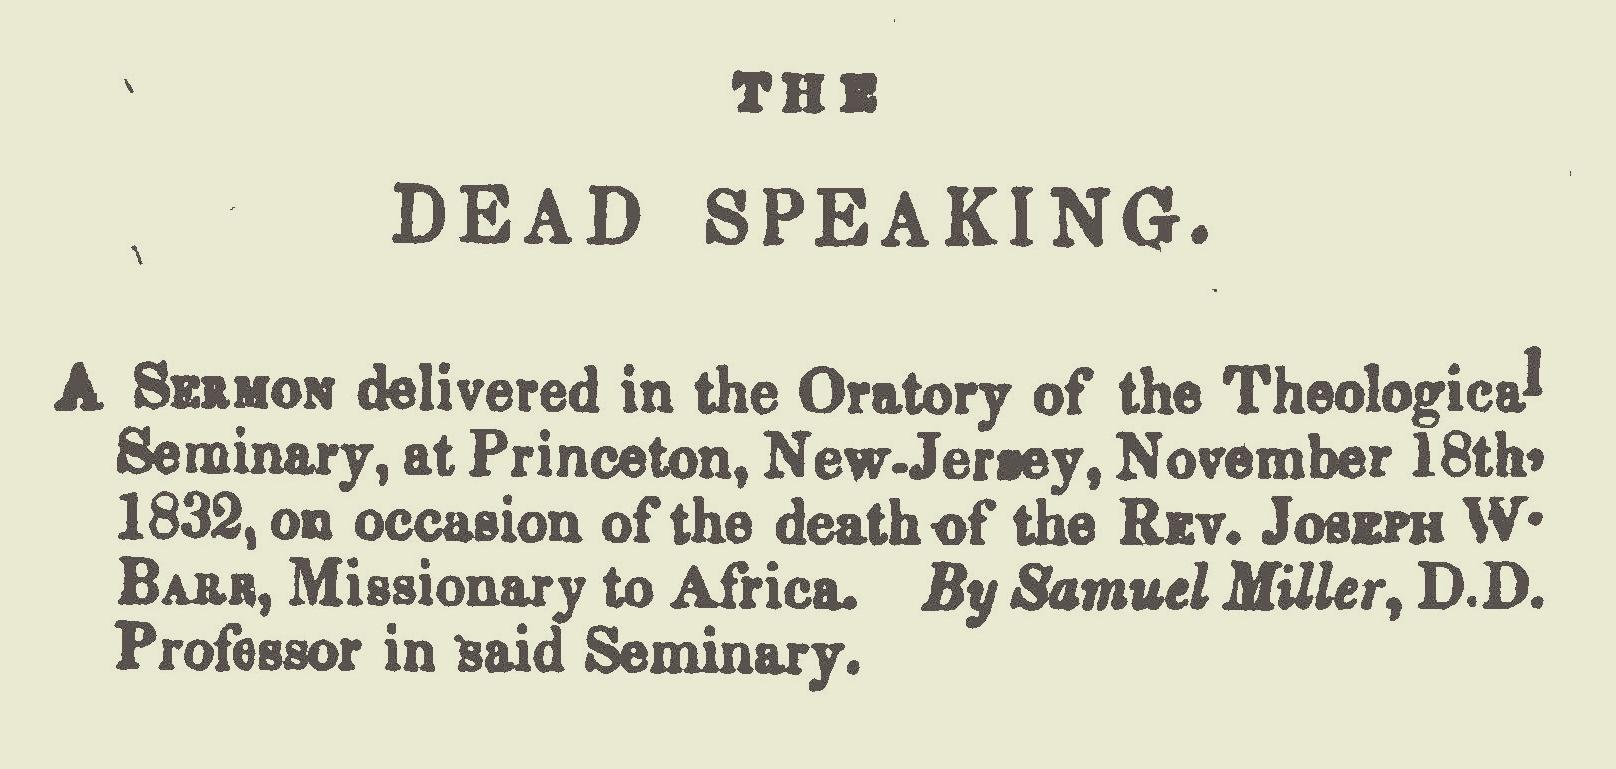 Miller, Samuel, The Dead Speaking Title Page.jpg